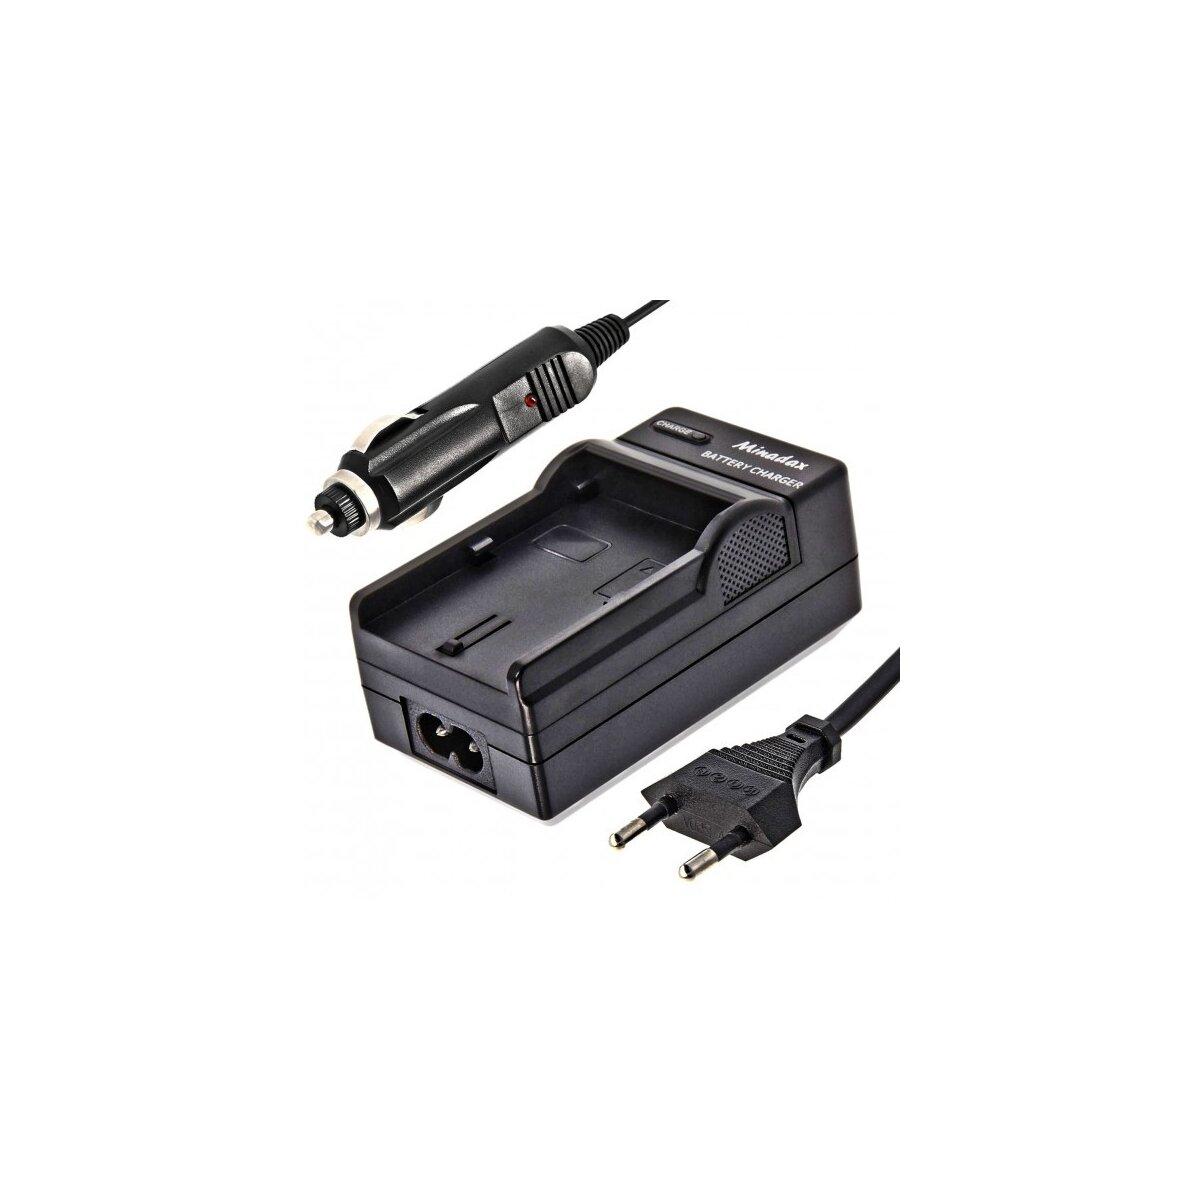 Minadax® Ladegeraet 100% kompatibel fuer Panasonic VBG-130, VBG-260, CGA-DU07, CGA-DU14, CGA-DU21, VBG-070 inkl. Auto Ladekabel, Ladeschale austauschbar